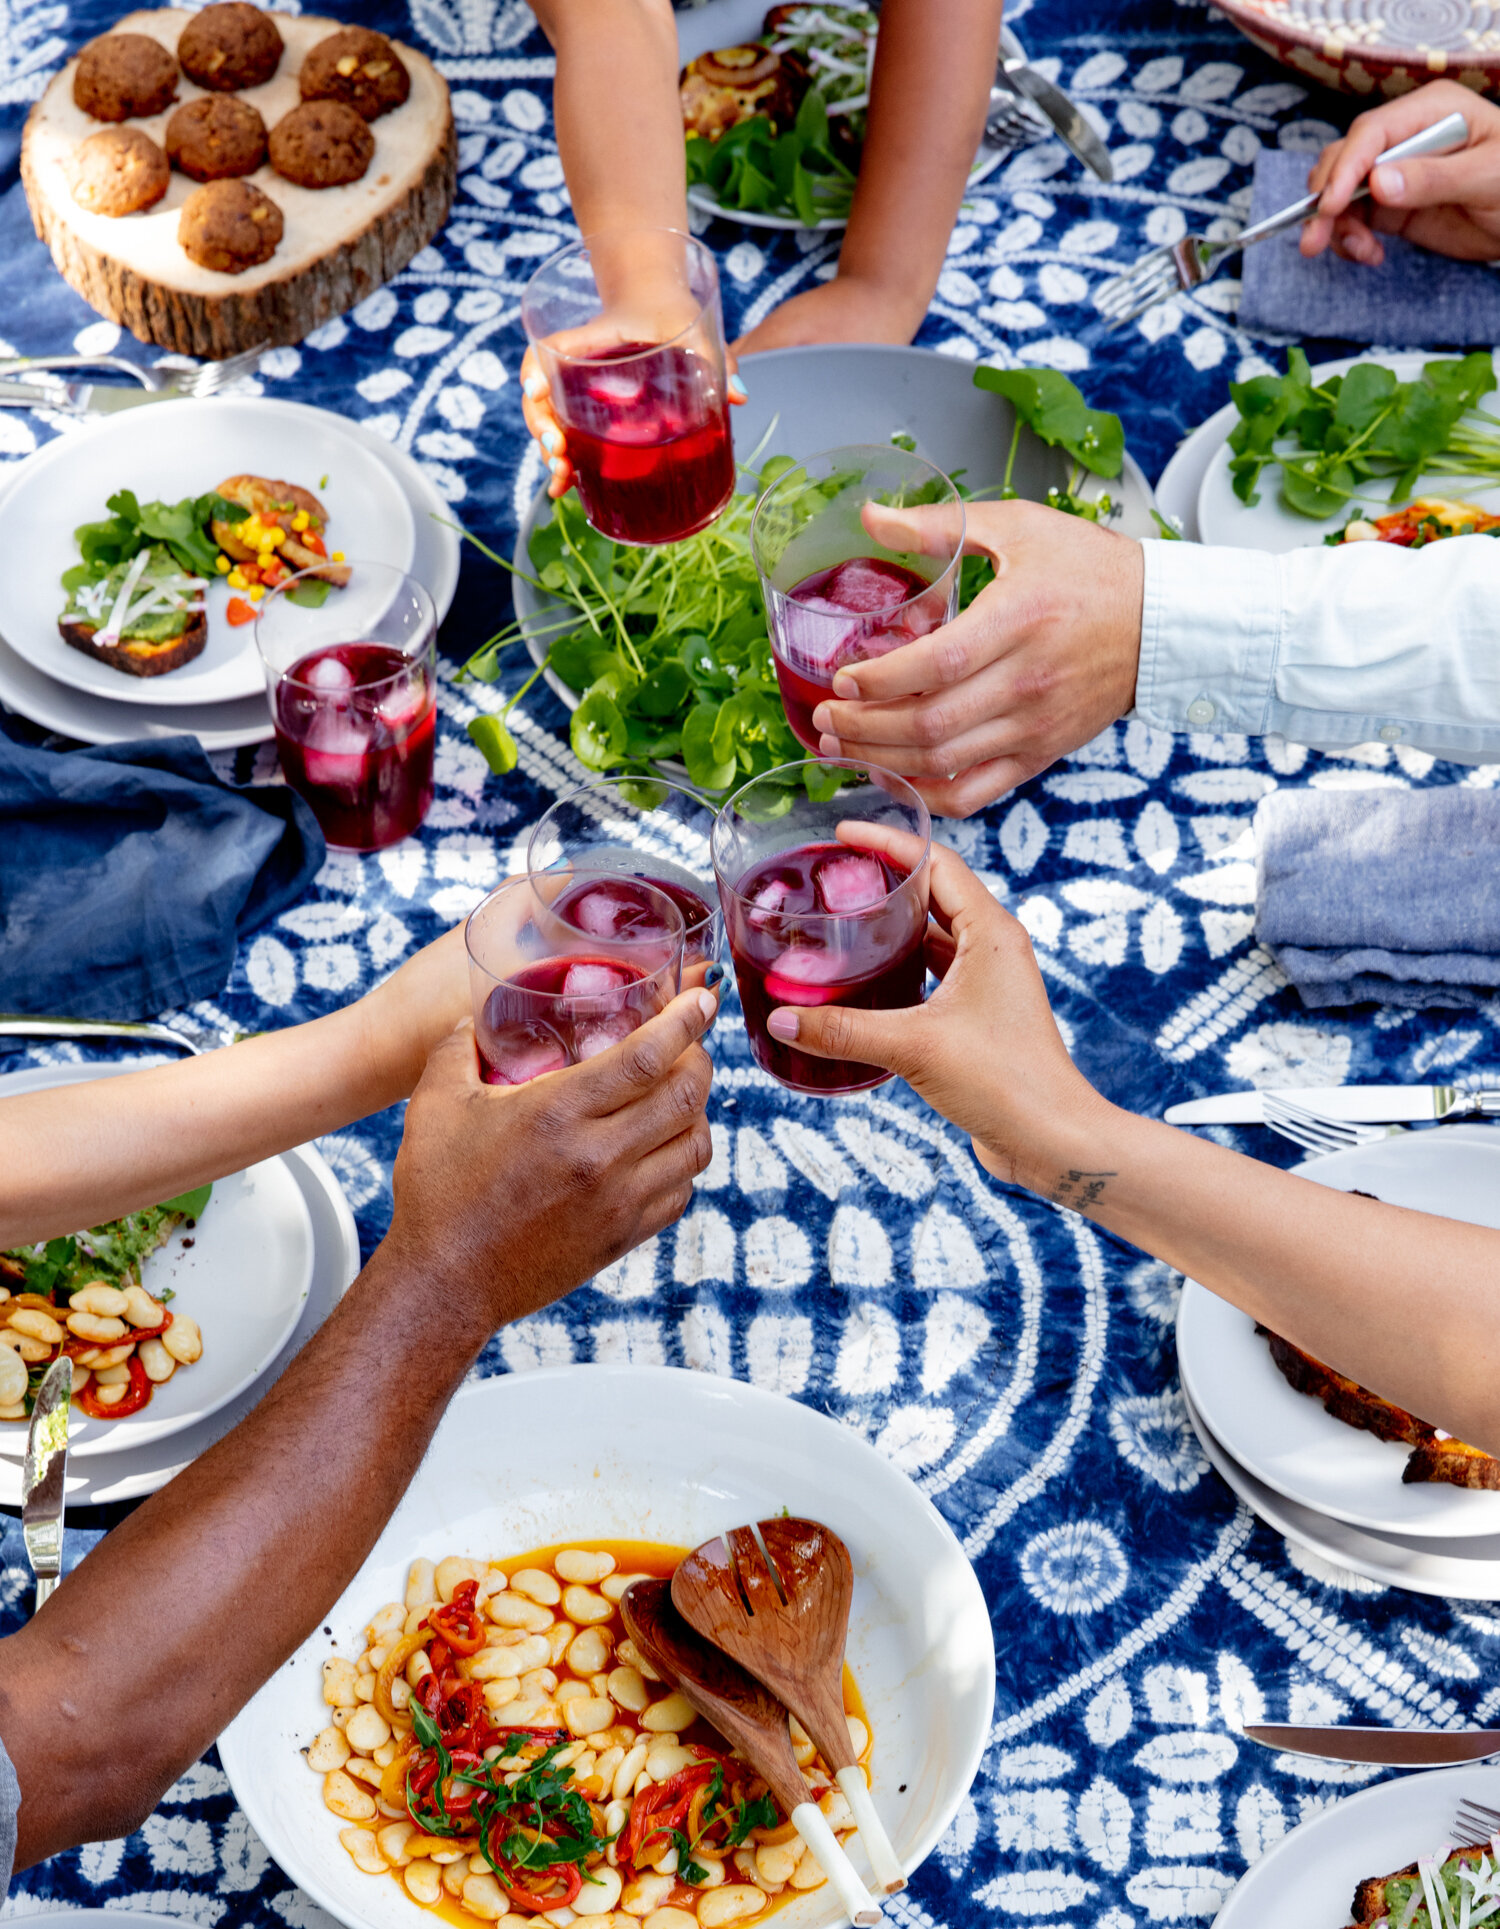 erin-scott-san-francisco-california-food-photographer-bryant-terry_williams-sonoma-catalog-tabletop-0438.jpg